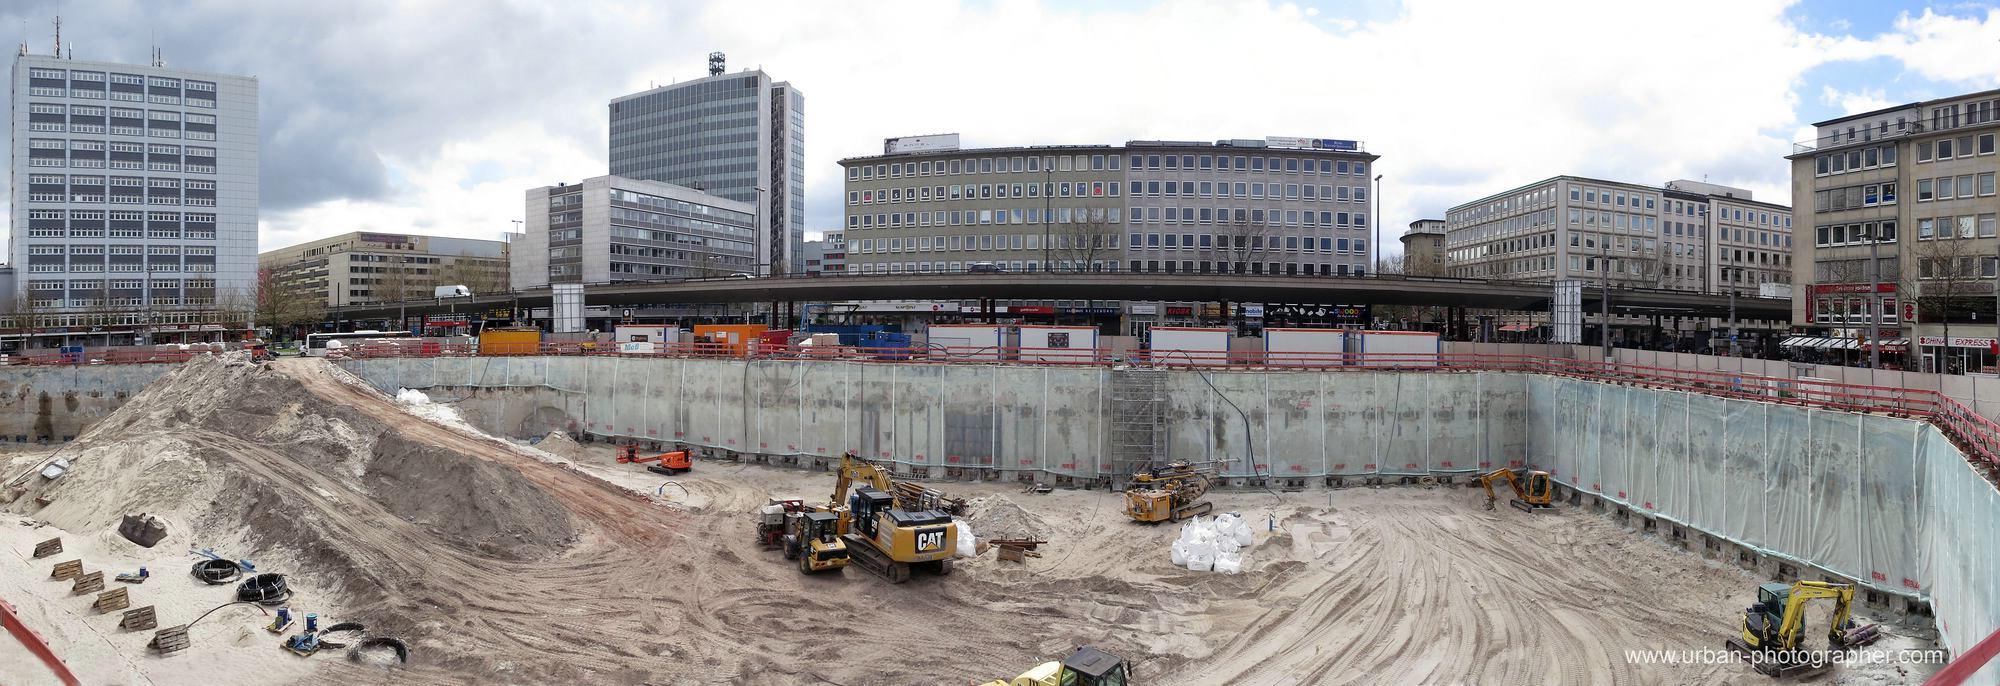 Baustelle Bahnhofsplatz 45